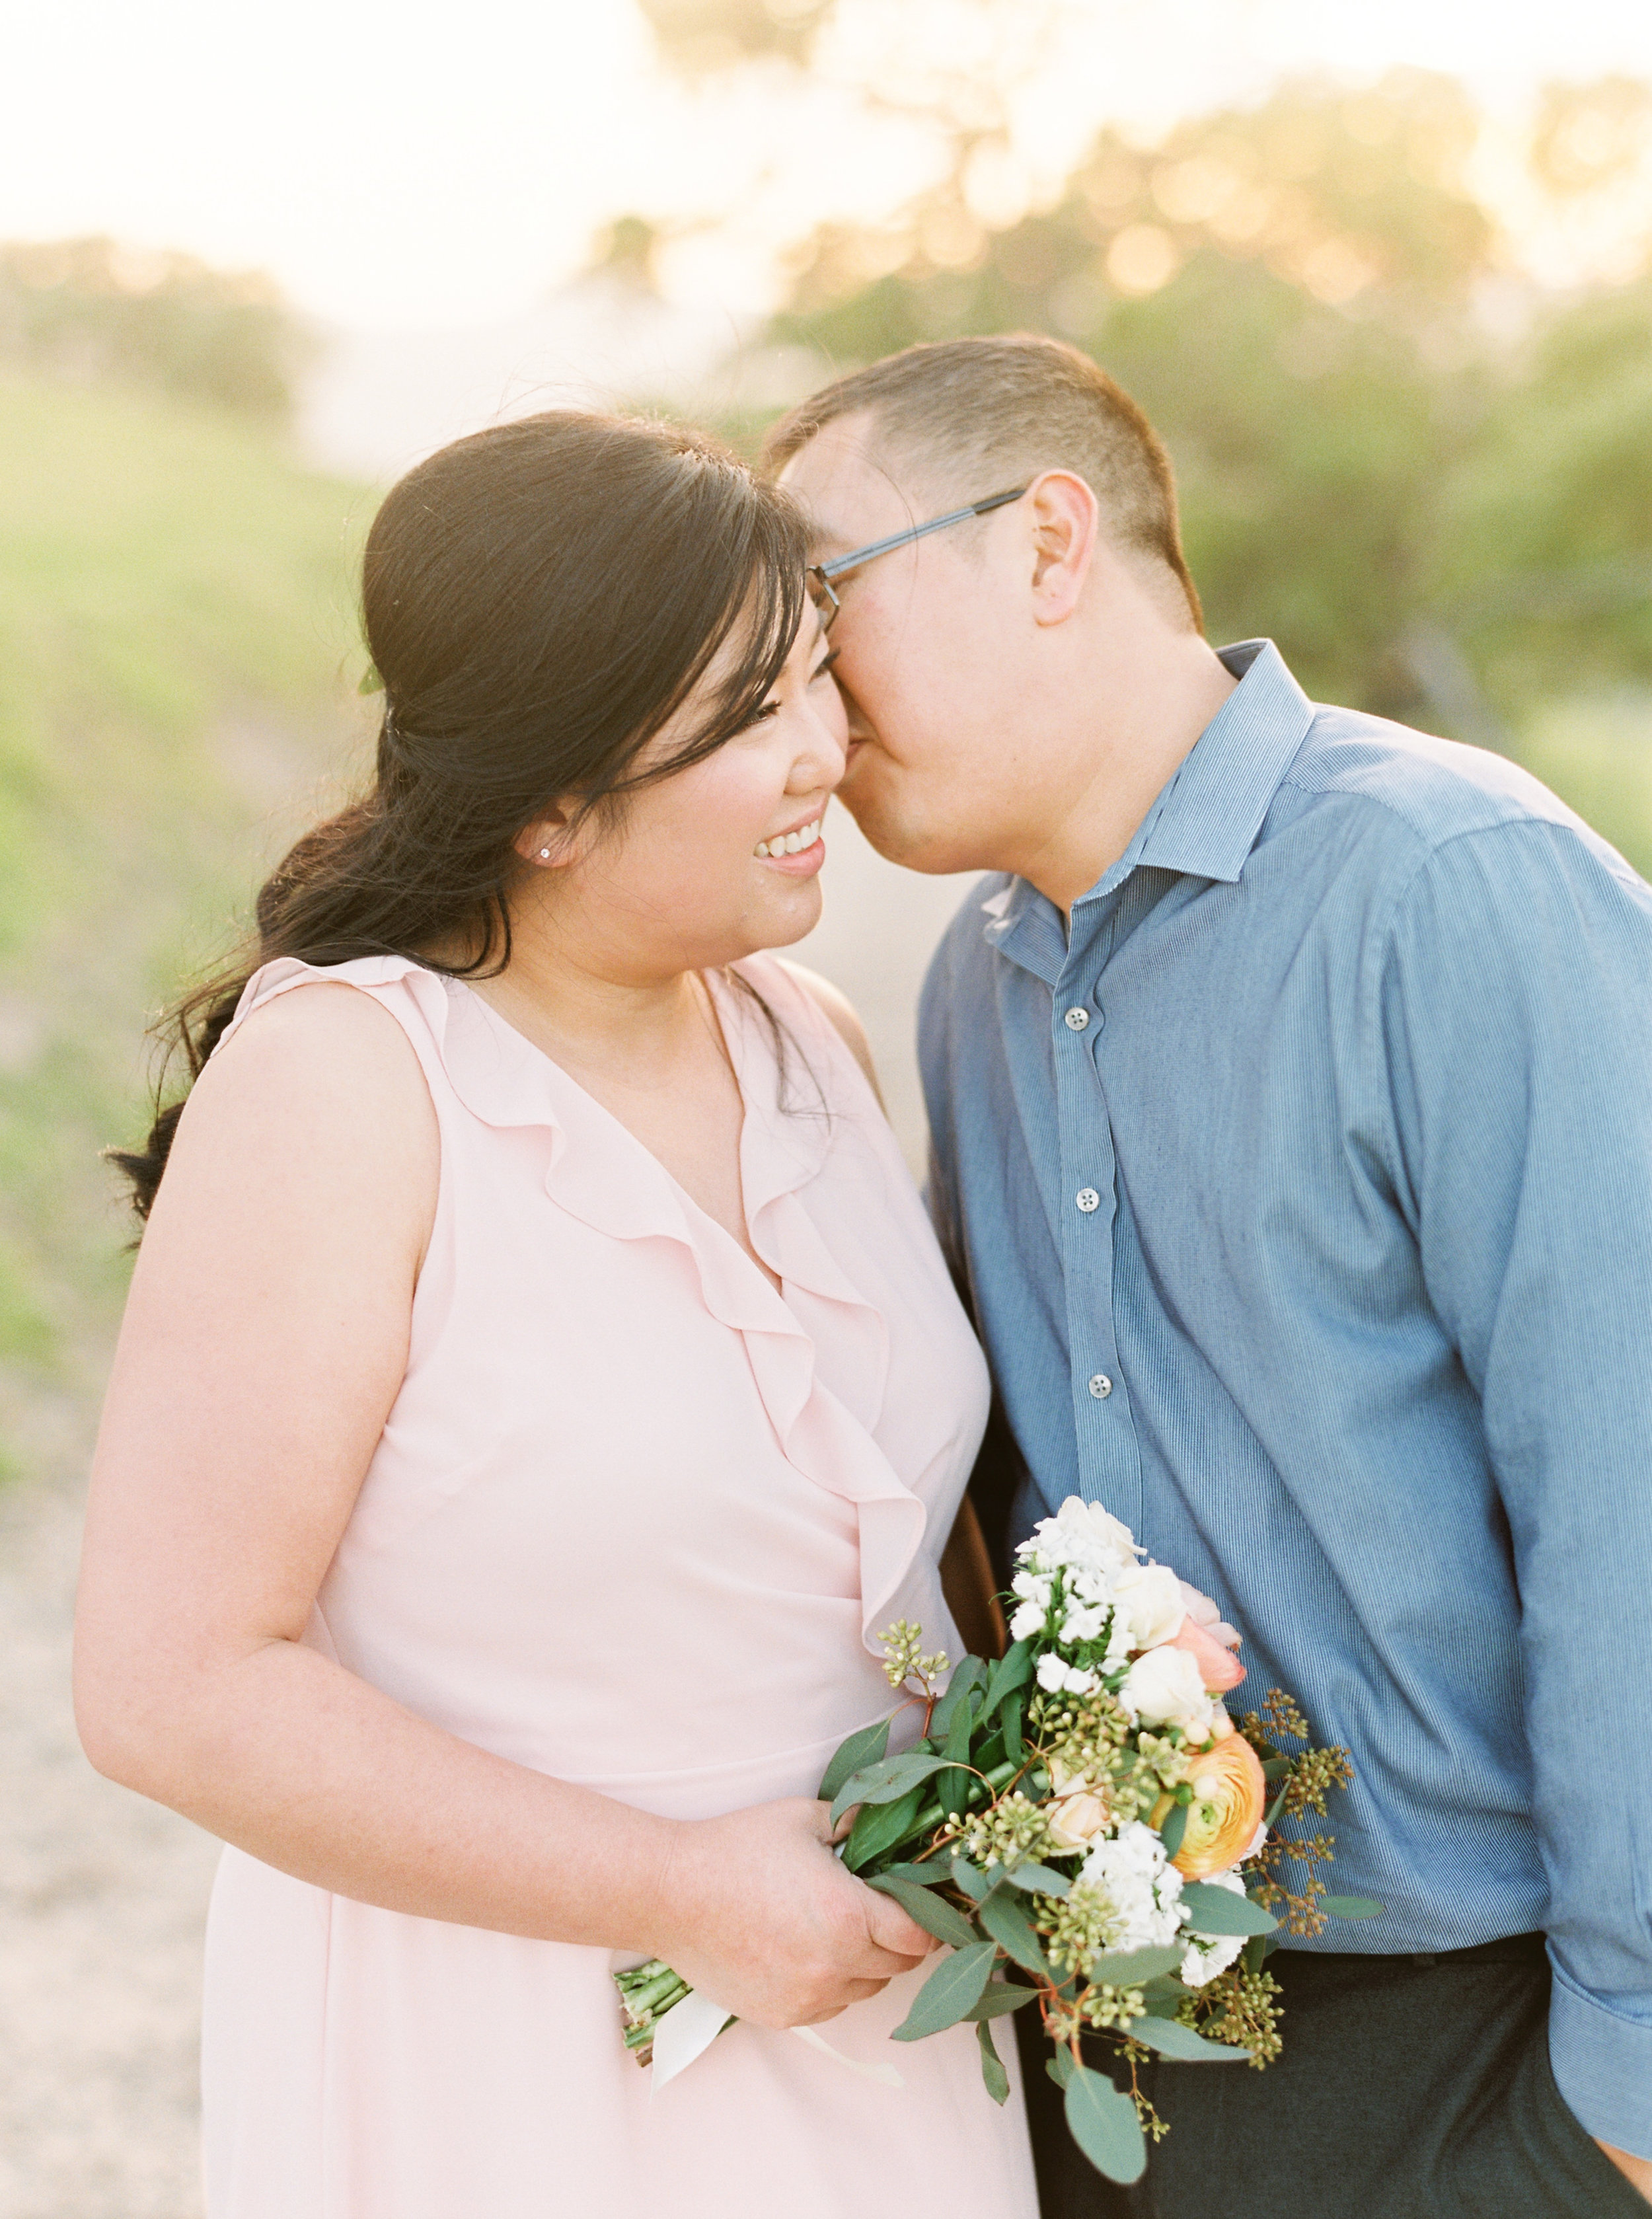 del-valle-livermore-bay-area-wedding-photographer-59.jpg